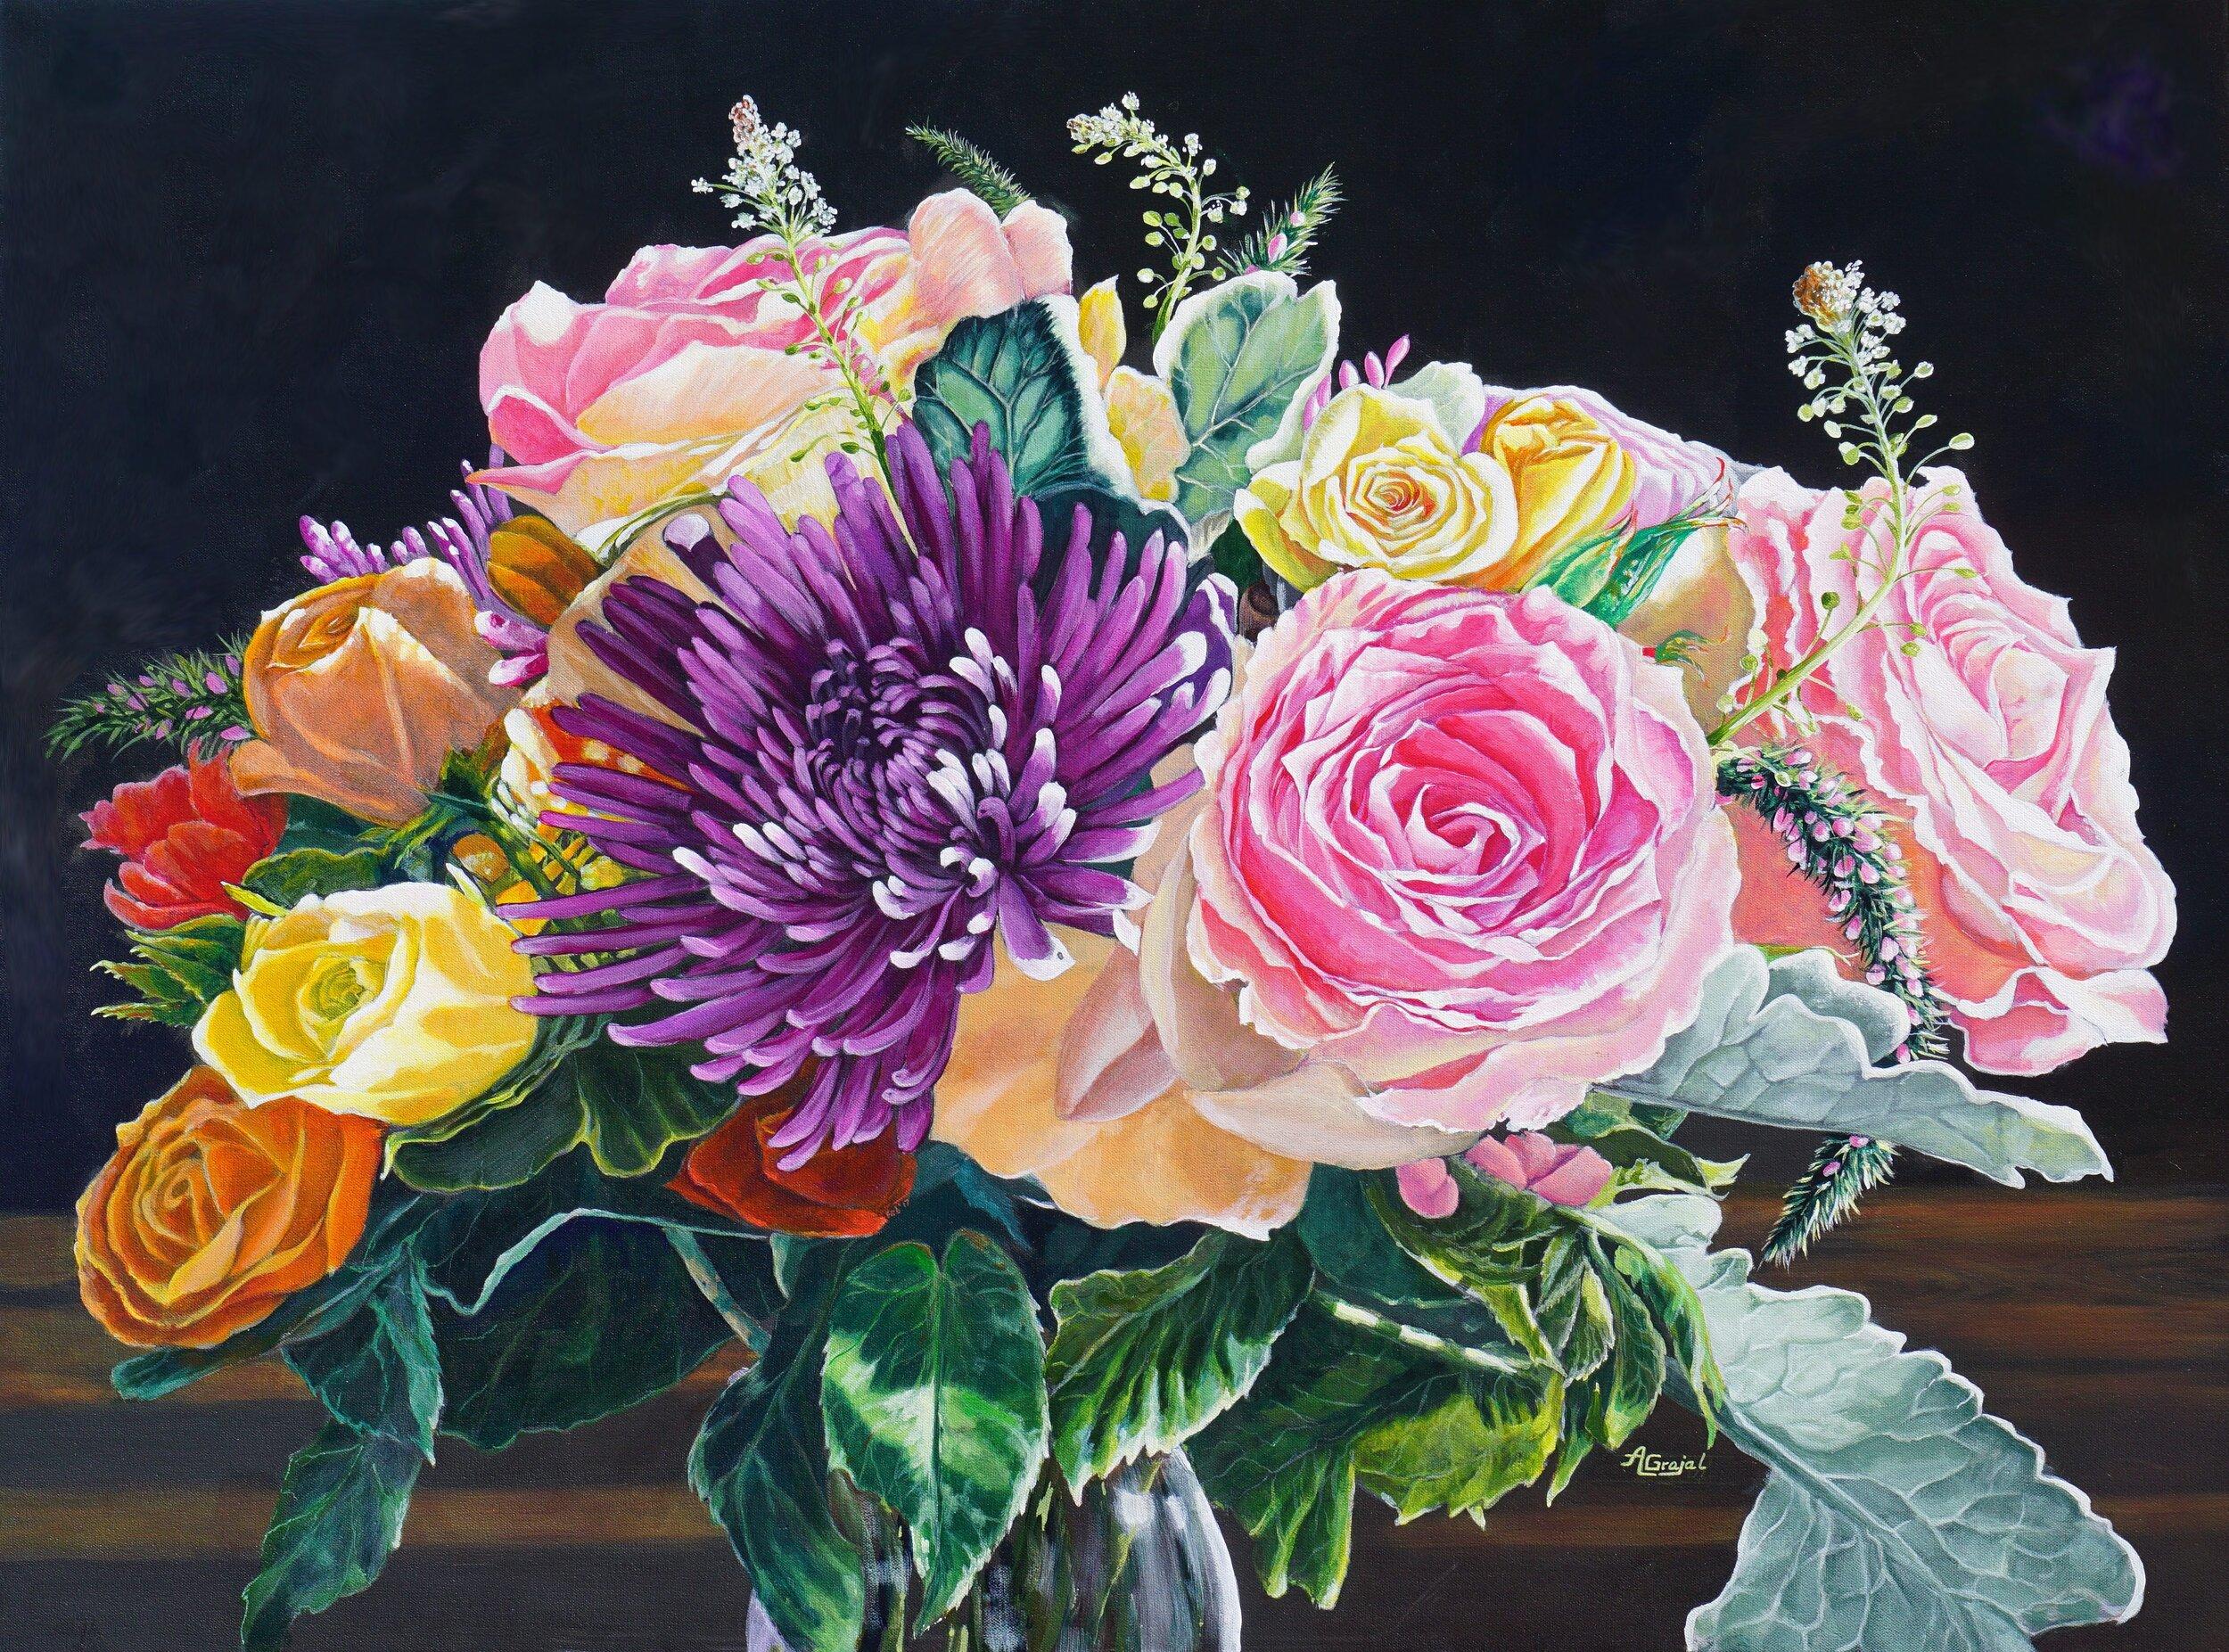 """Roses Dutch Style"" Acrylic on canvas 48"" x 36"". Giclee available on demand"